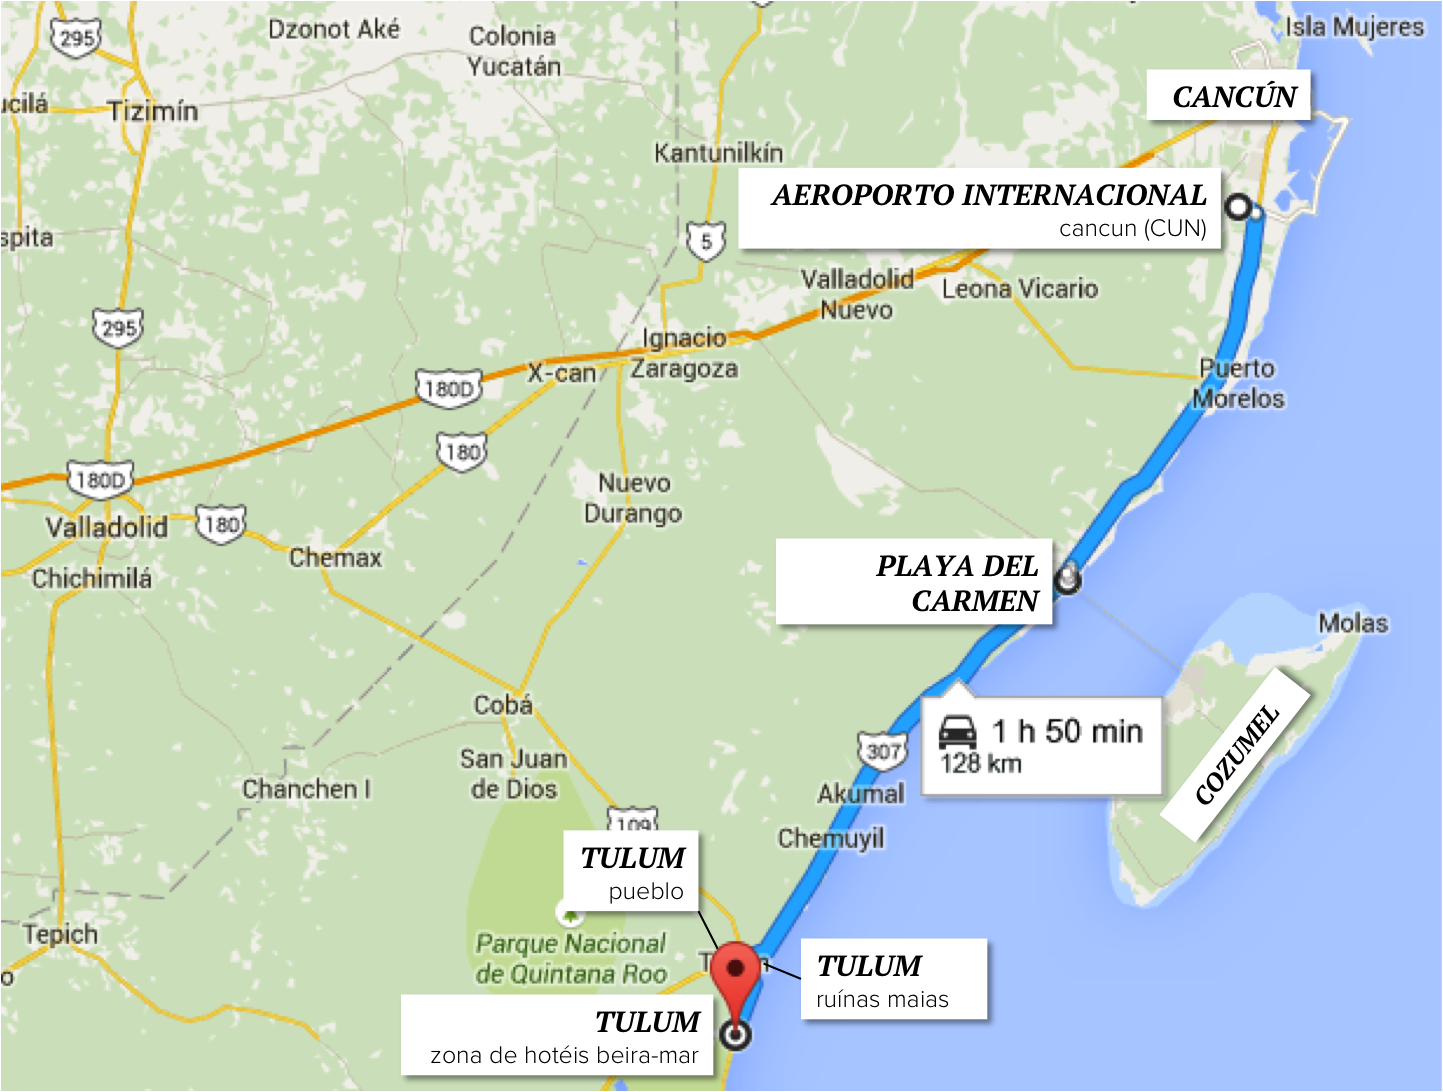 00 mapa cancun tulum estrada